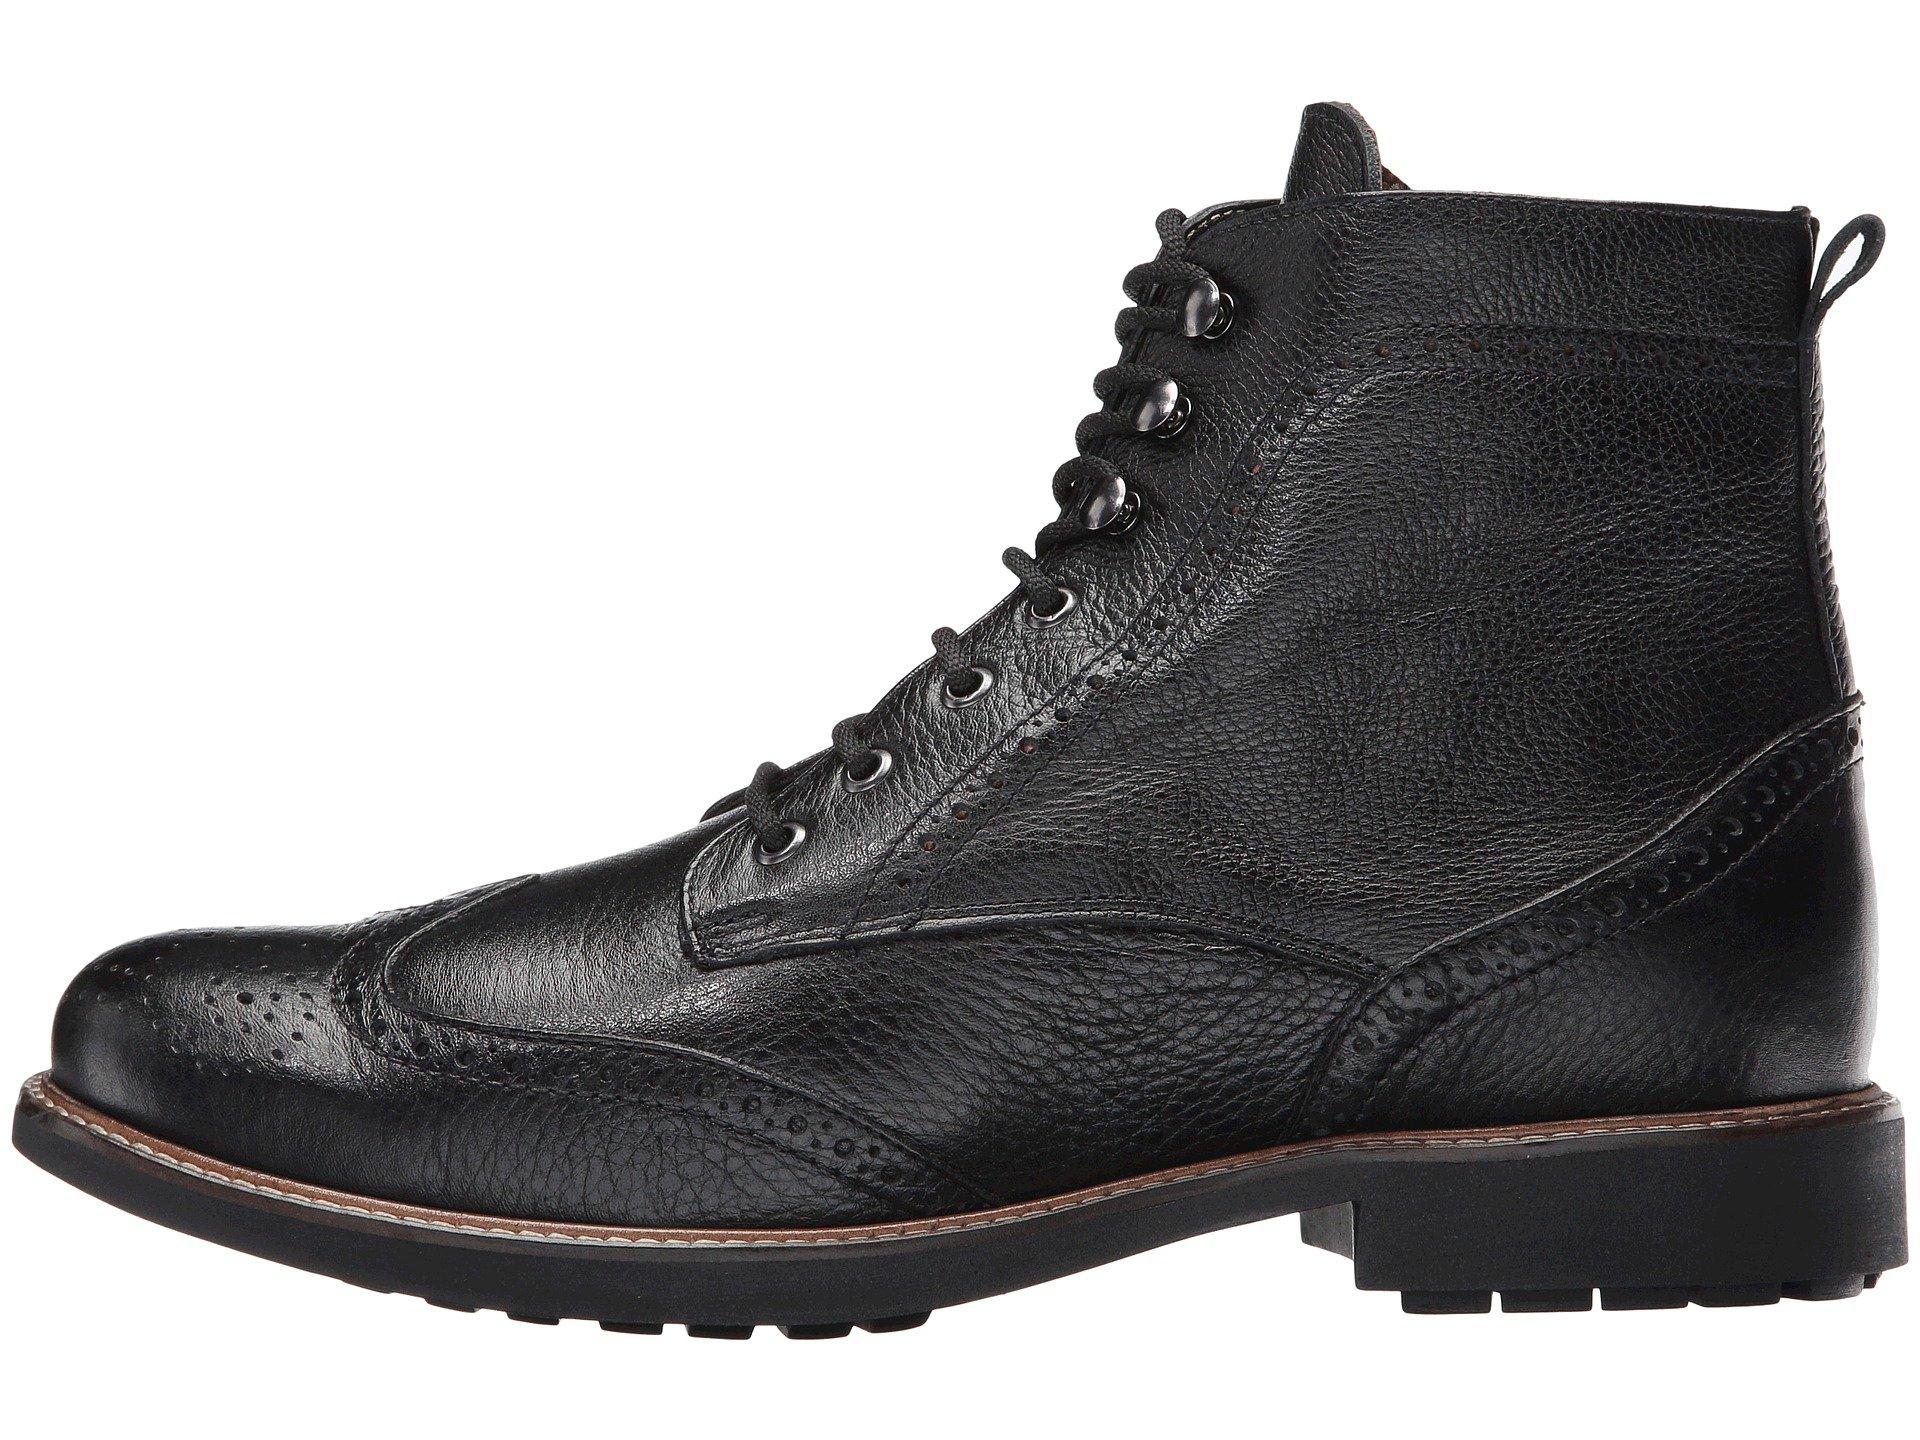 Boot Black Wing Matteo Perf Massimo qBOwUxtWg